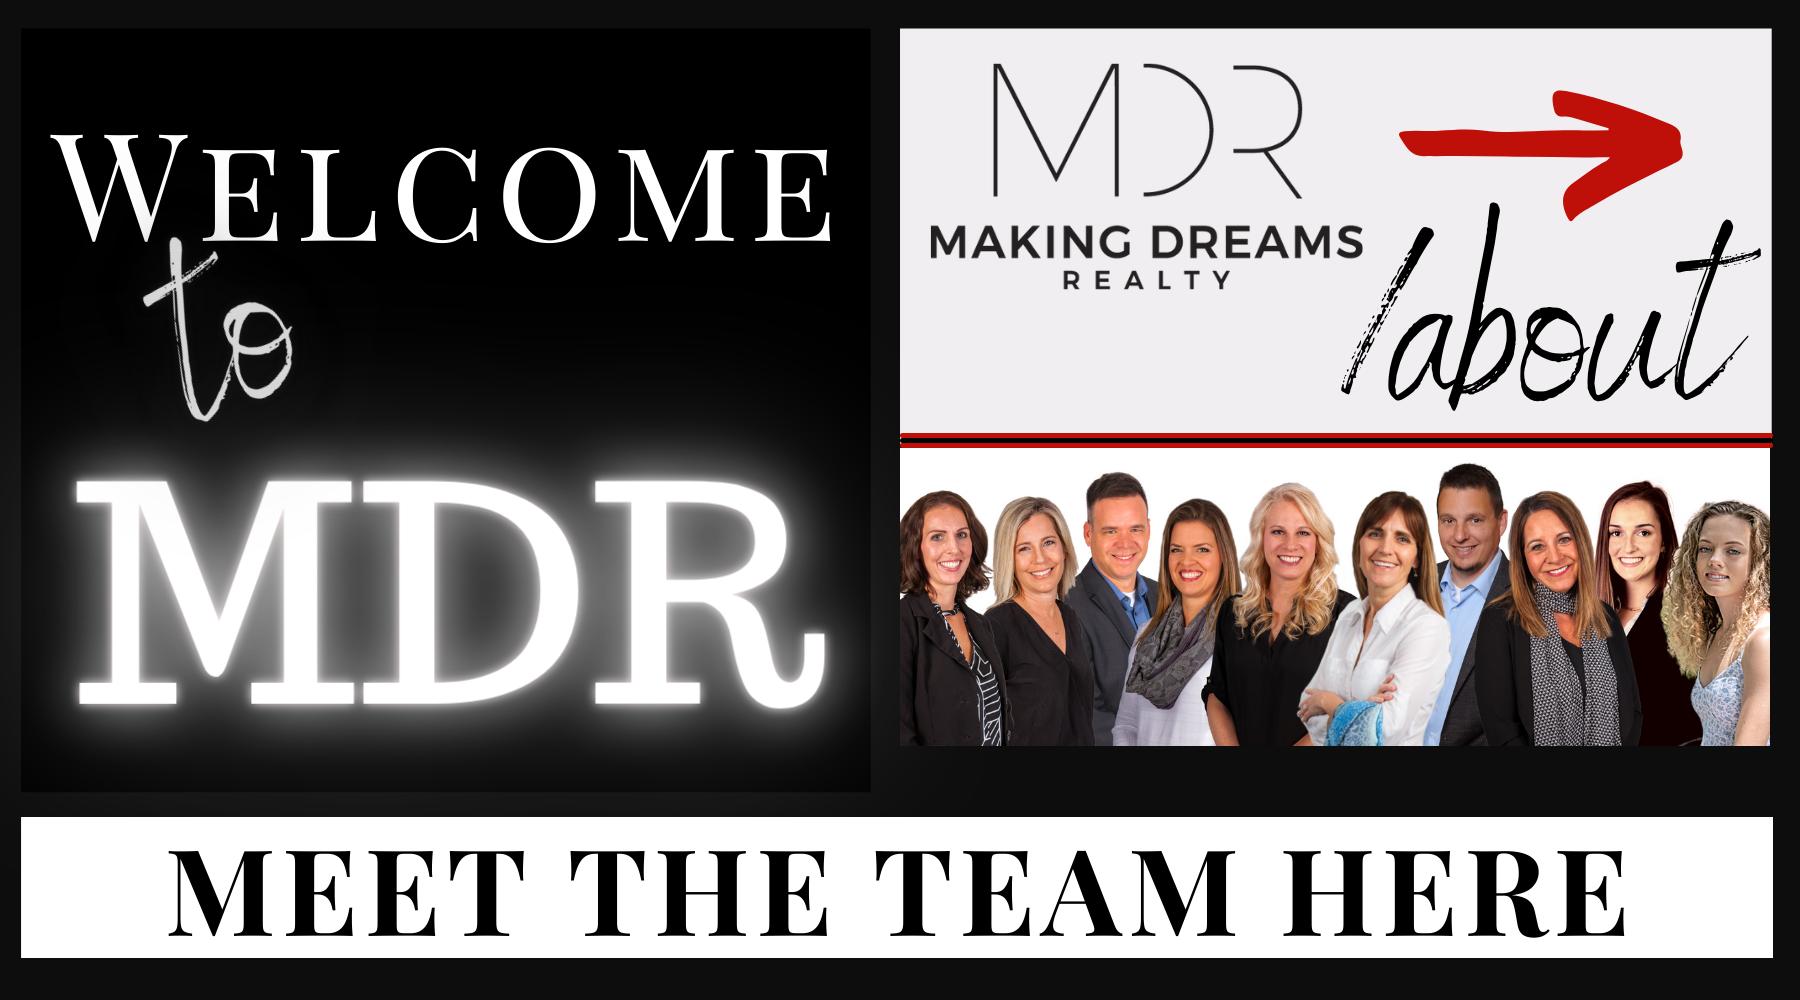 Meet the Team at MAKING DREAMS Realty